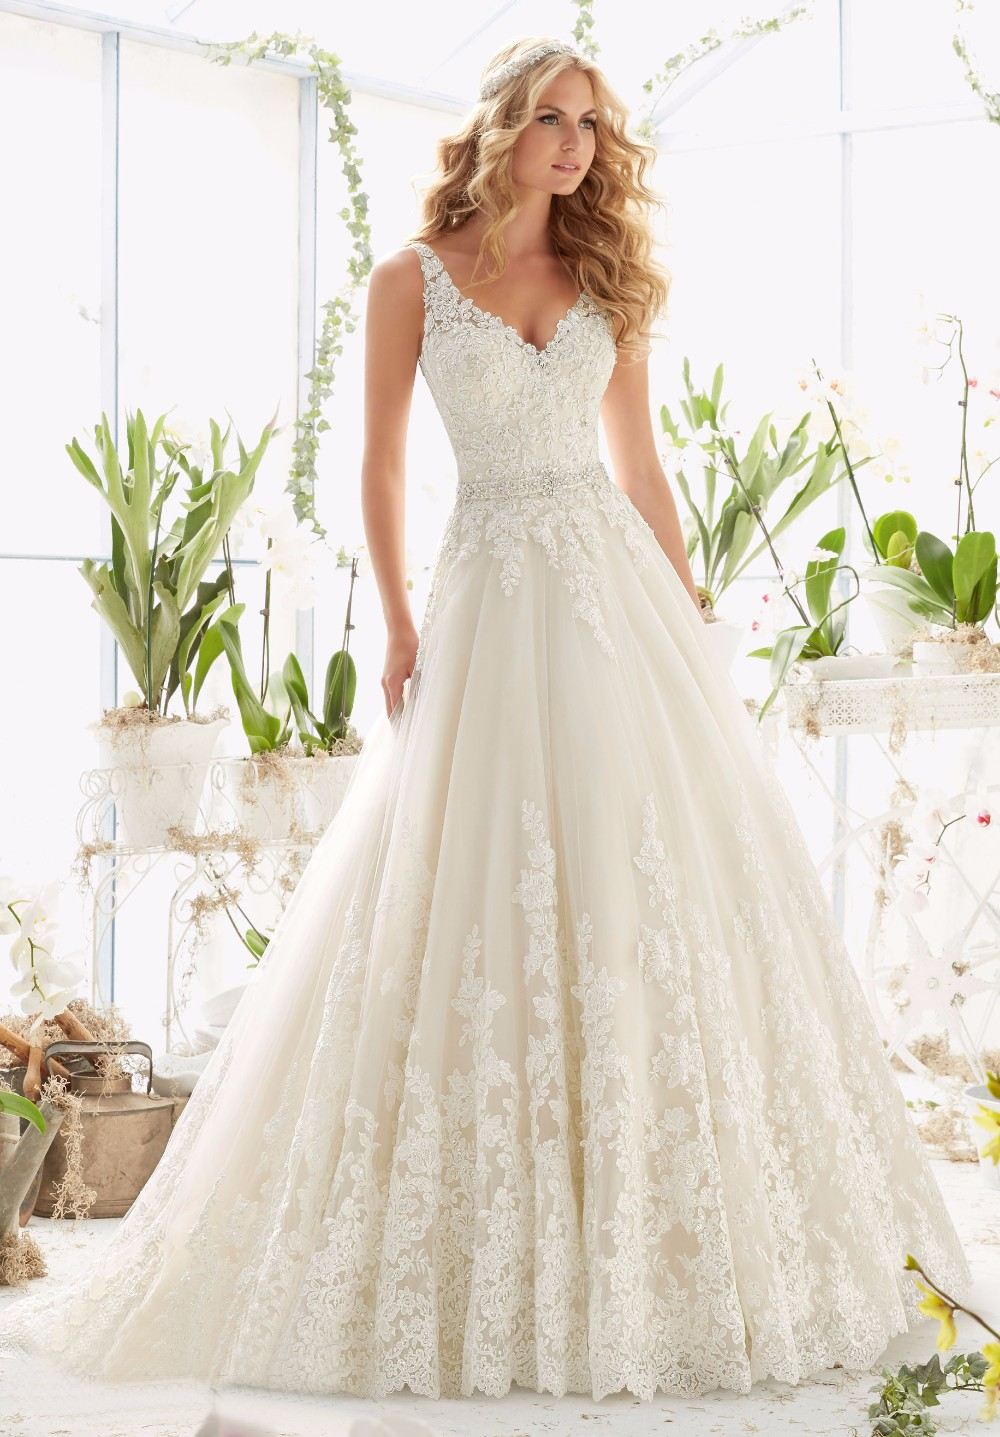 Backless Sexy Vintage Wedding Dress  Cute Dresses